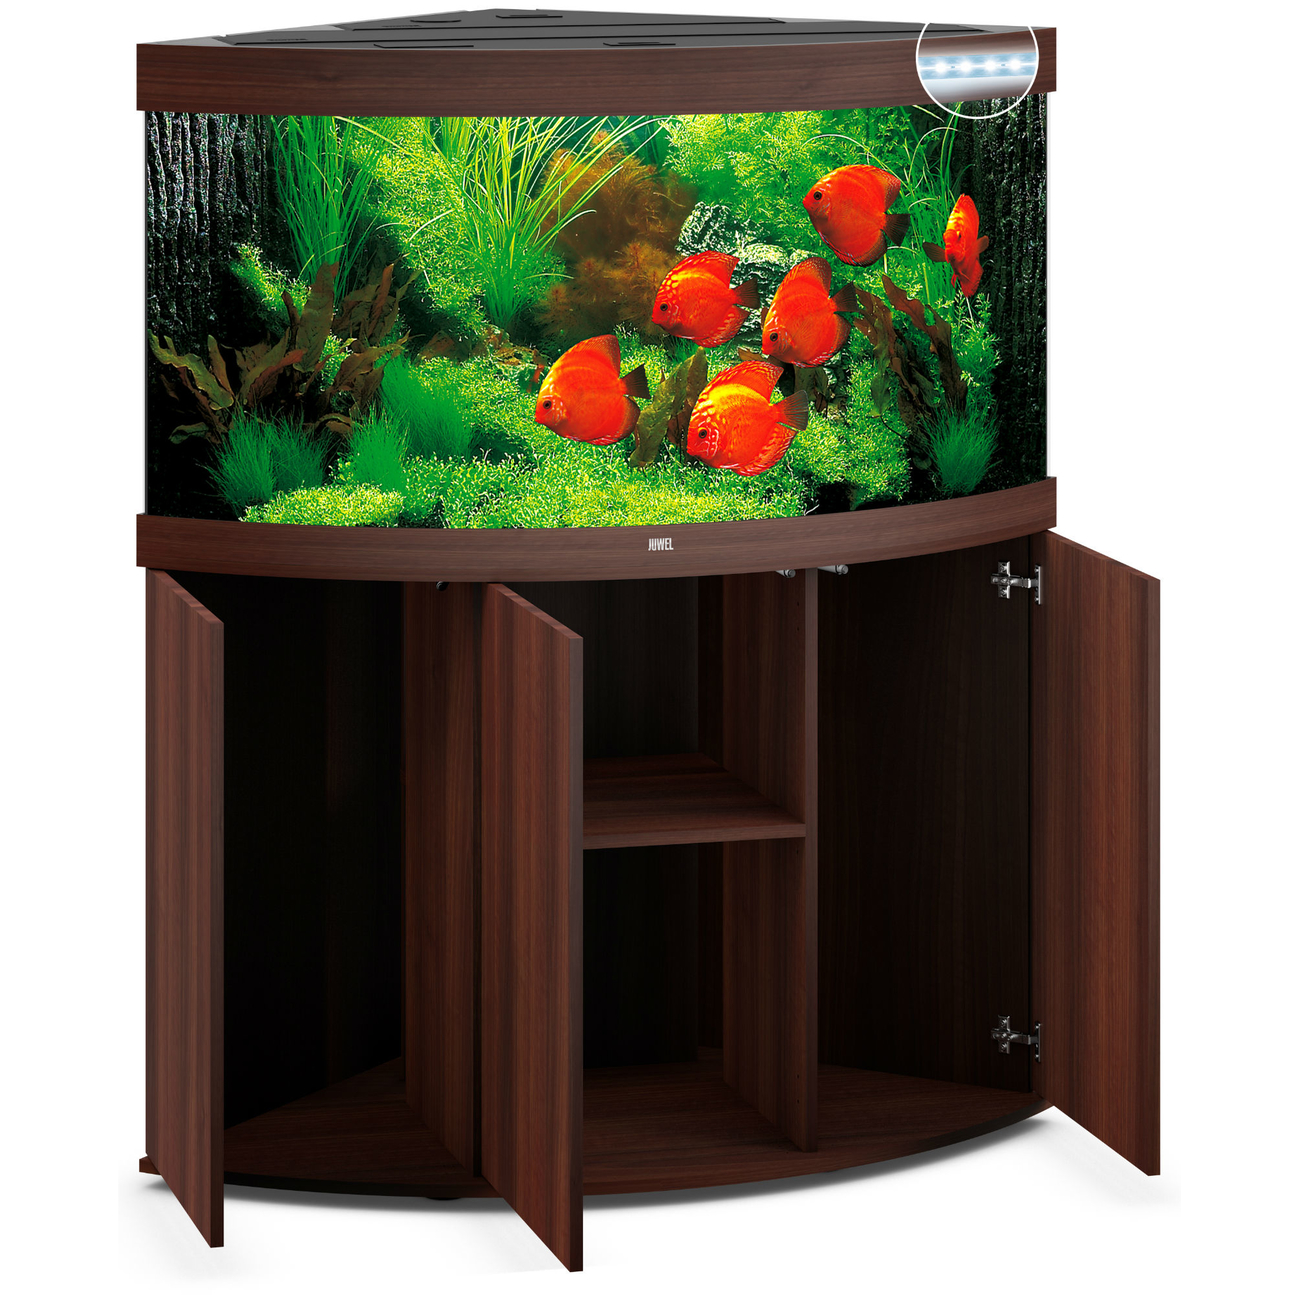 Juwel Trigon 350 LED Eck-Aquarium mit Unterschrank, Bild 17